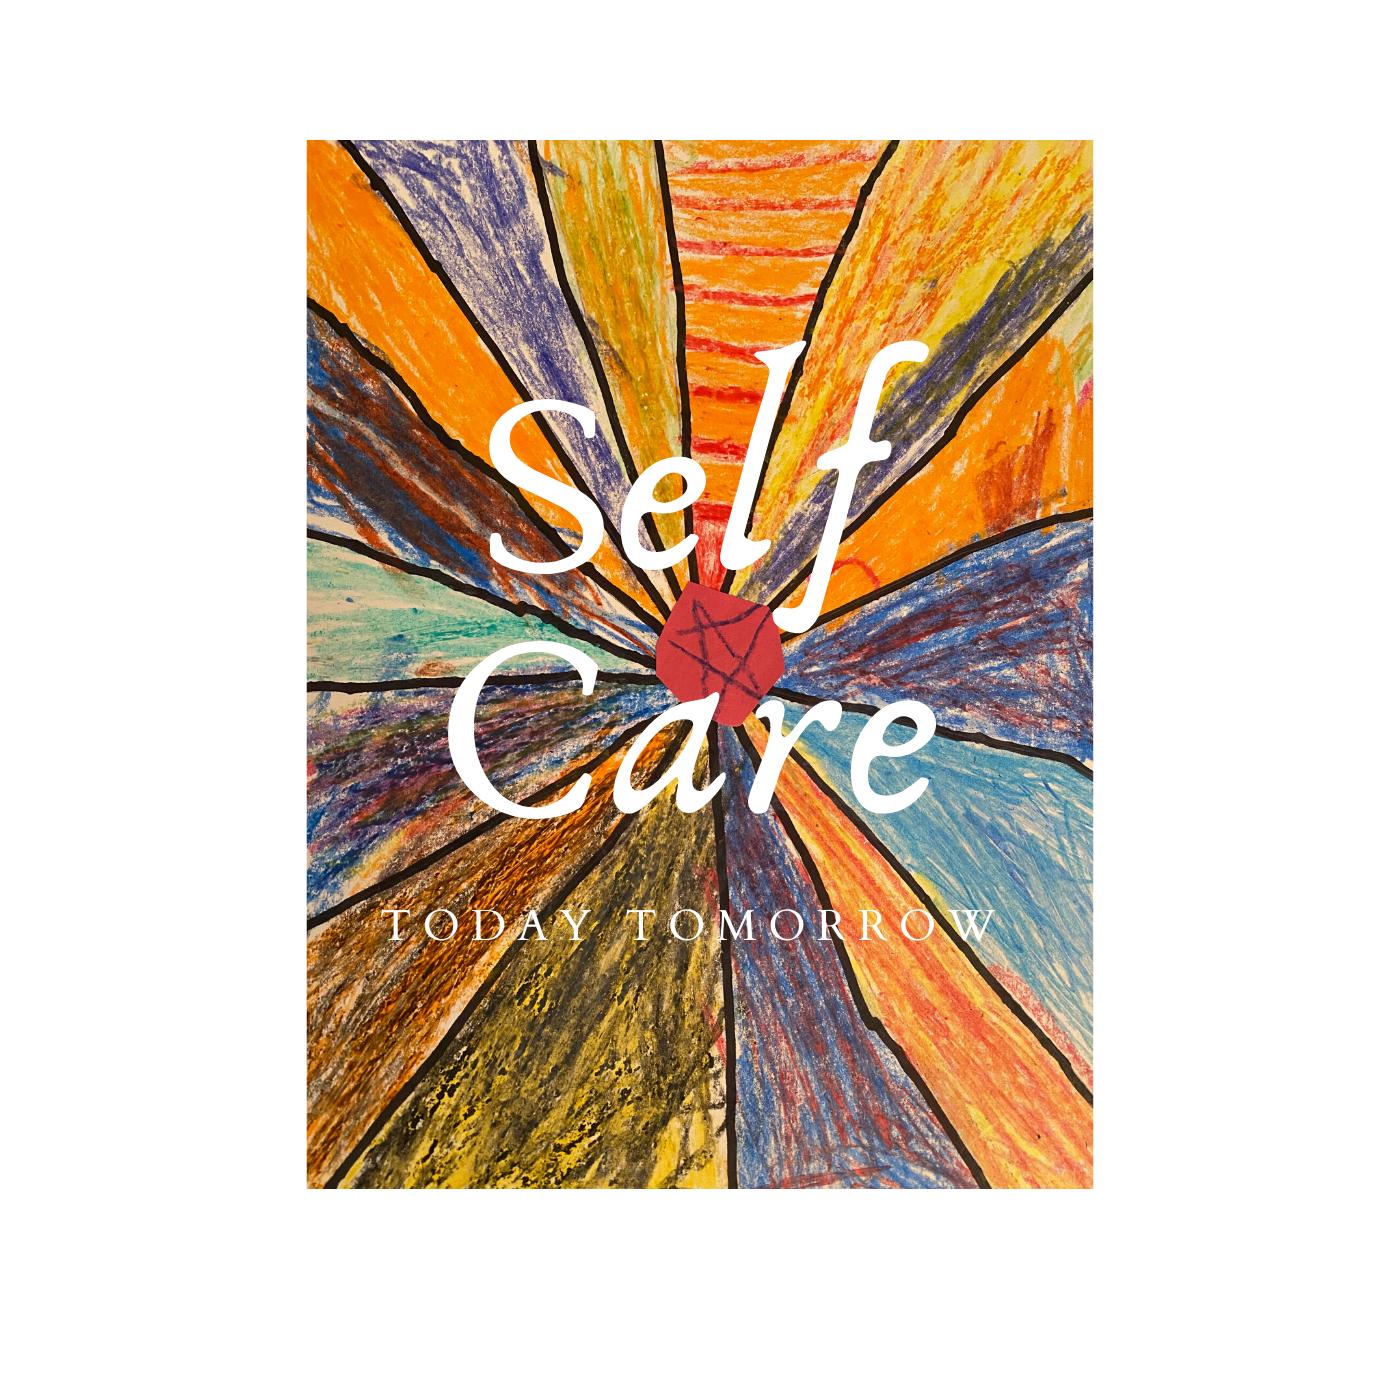 Self Care Today Tomorrow: Helping You Shine show art